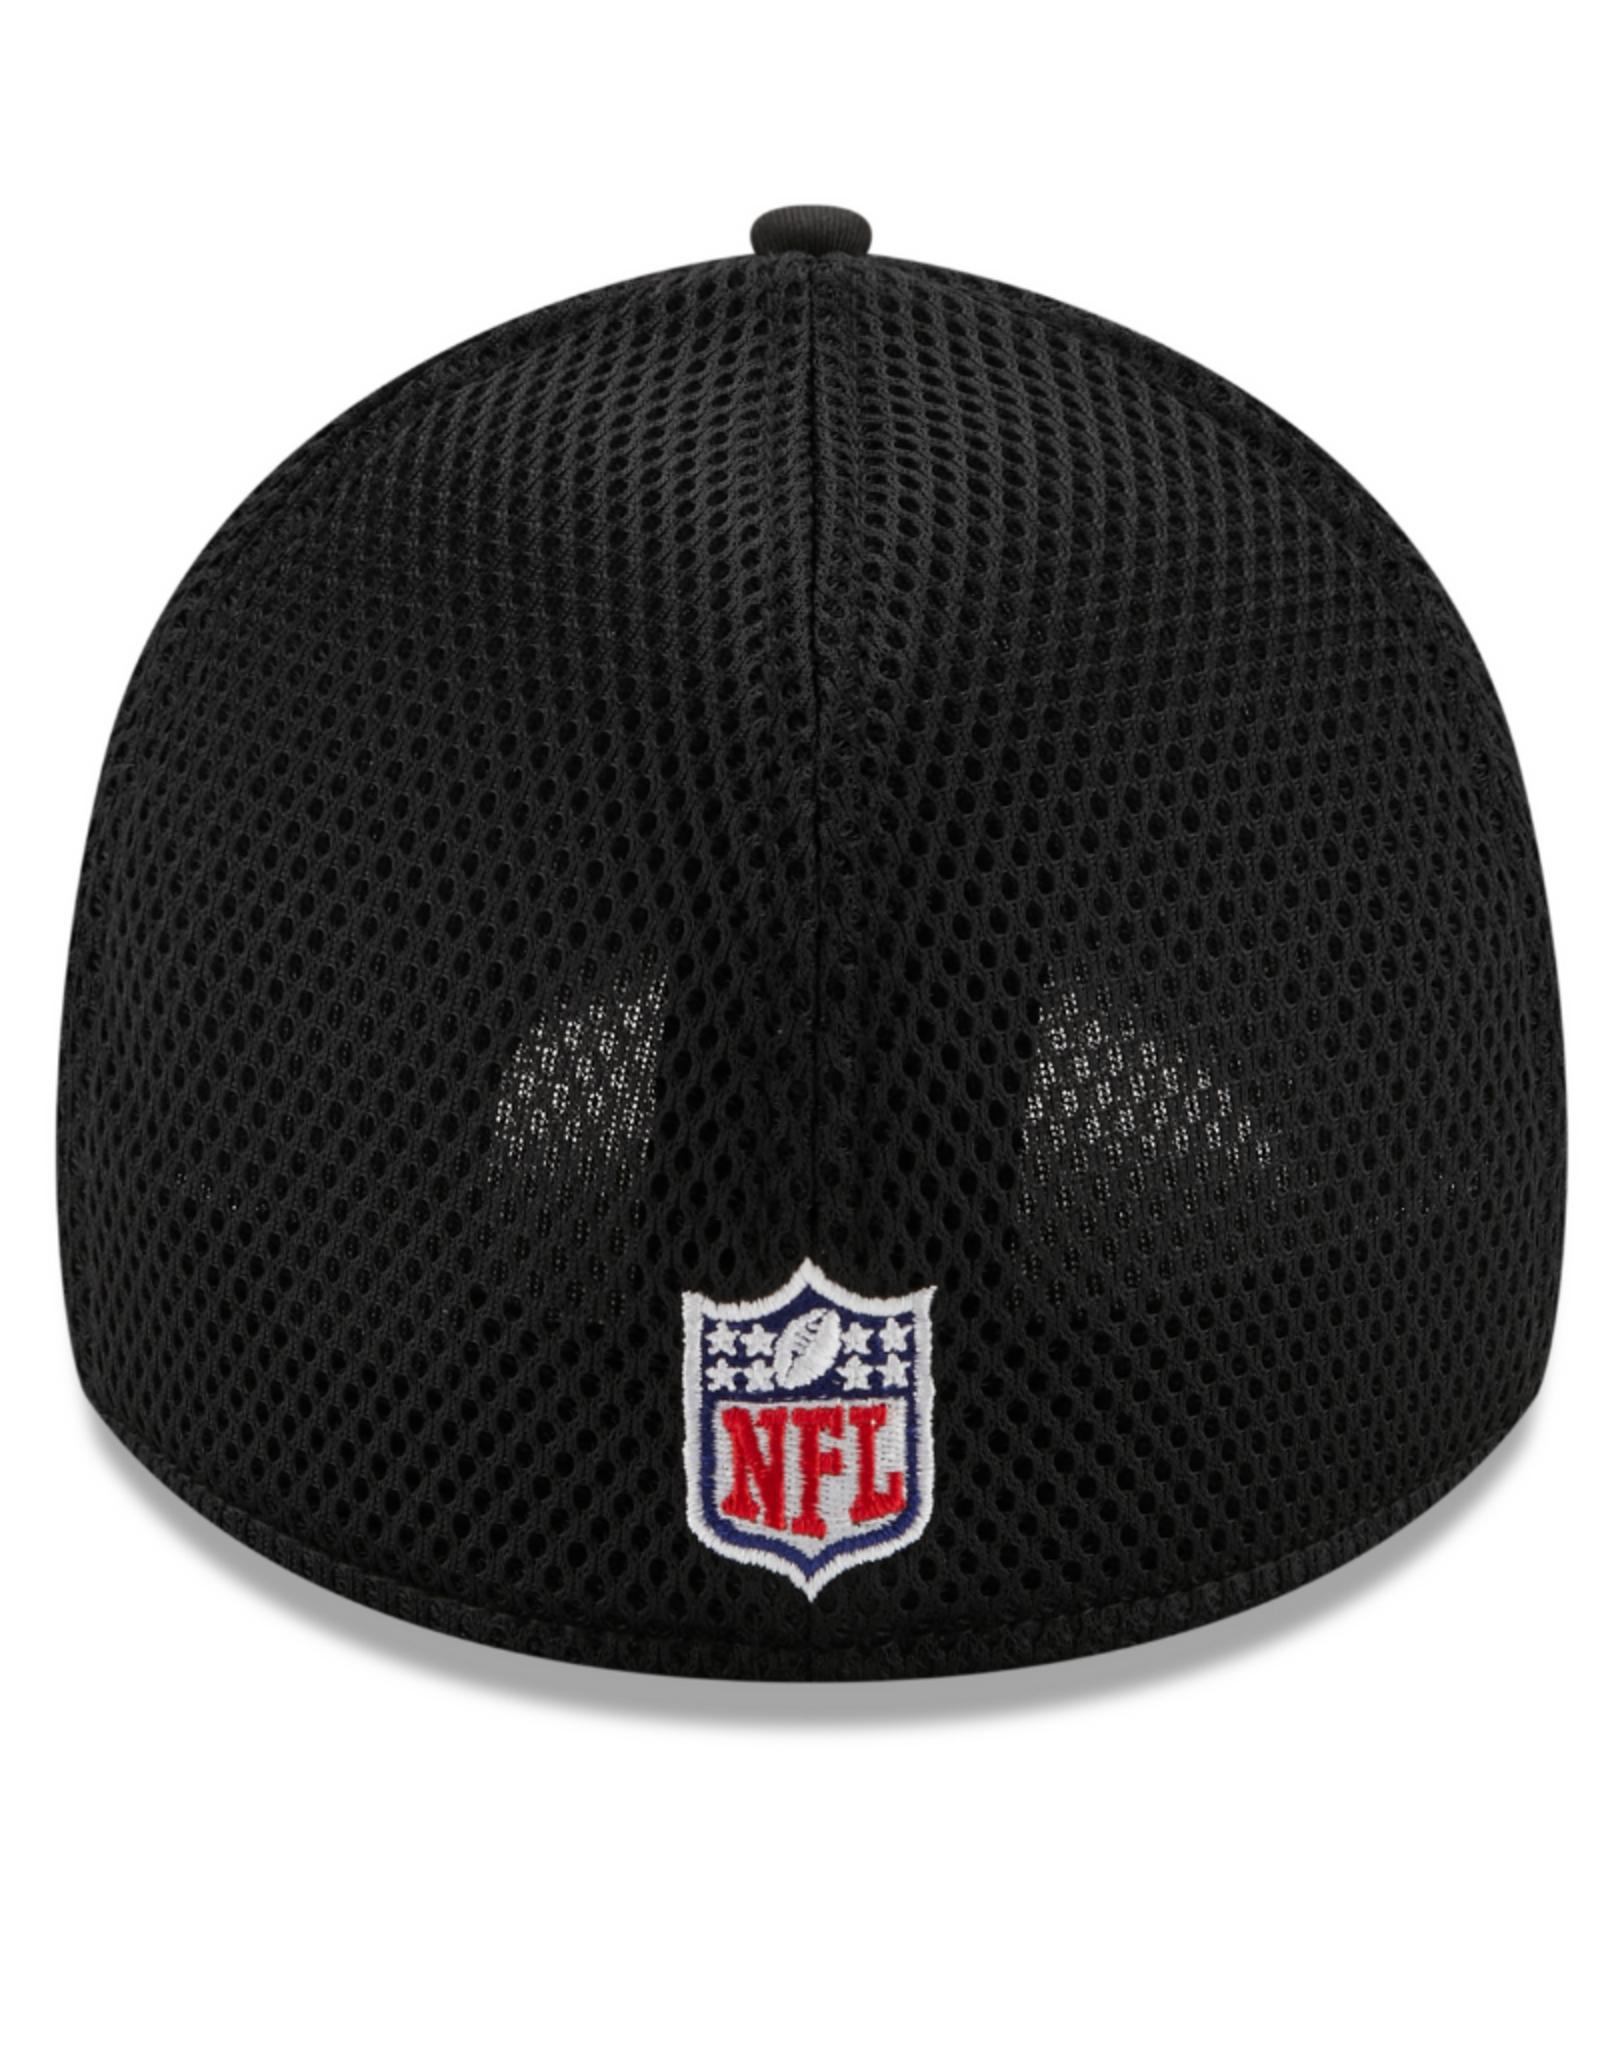 New Era Men's 39THIRTY Classic Neo B3 Hat Green Bay Packers Black